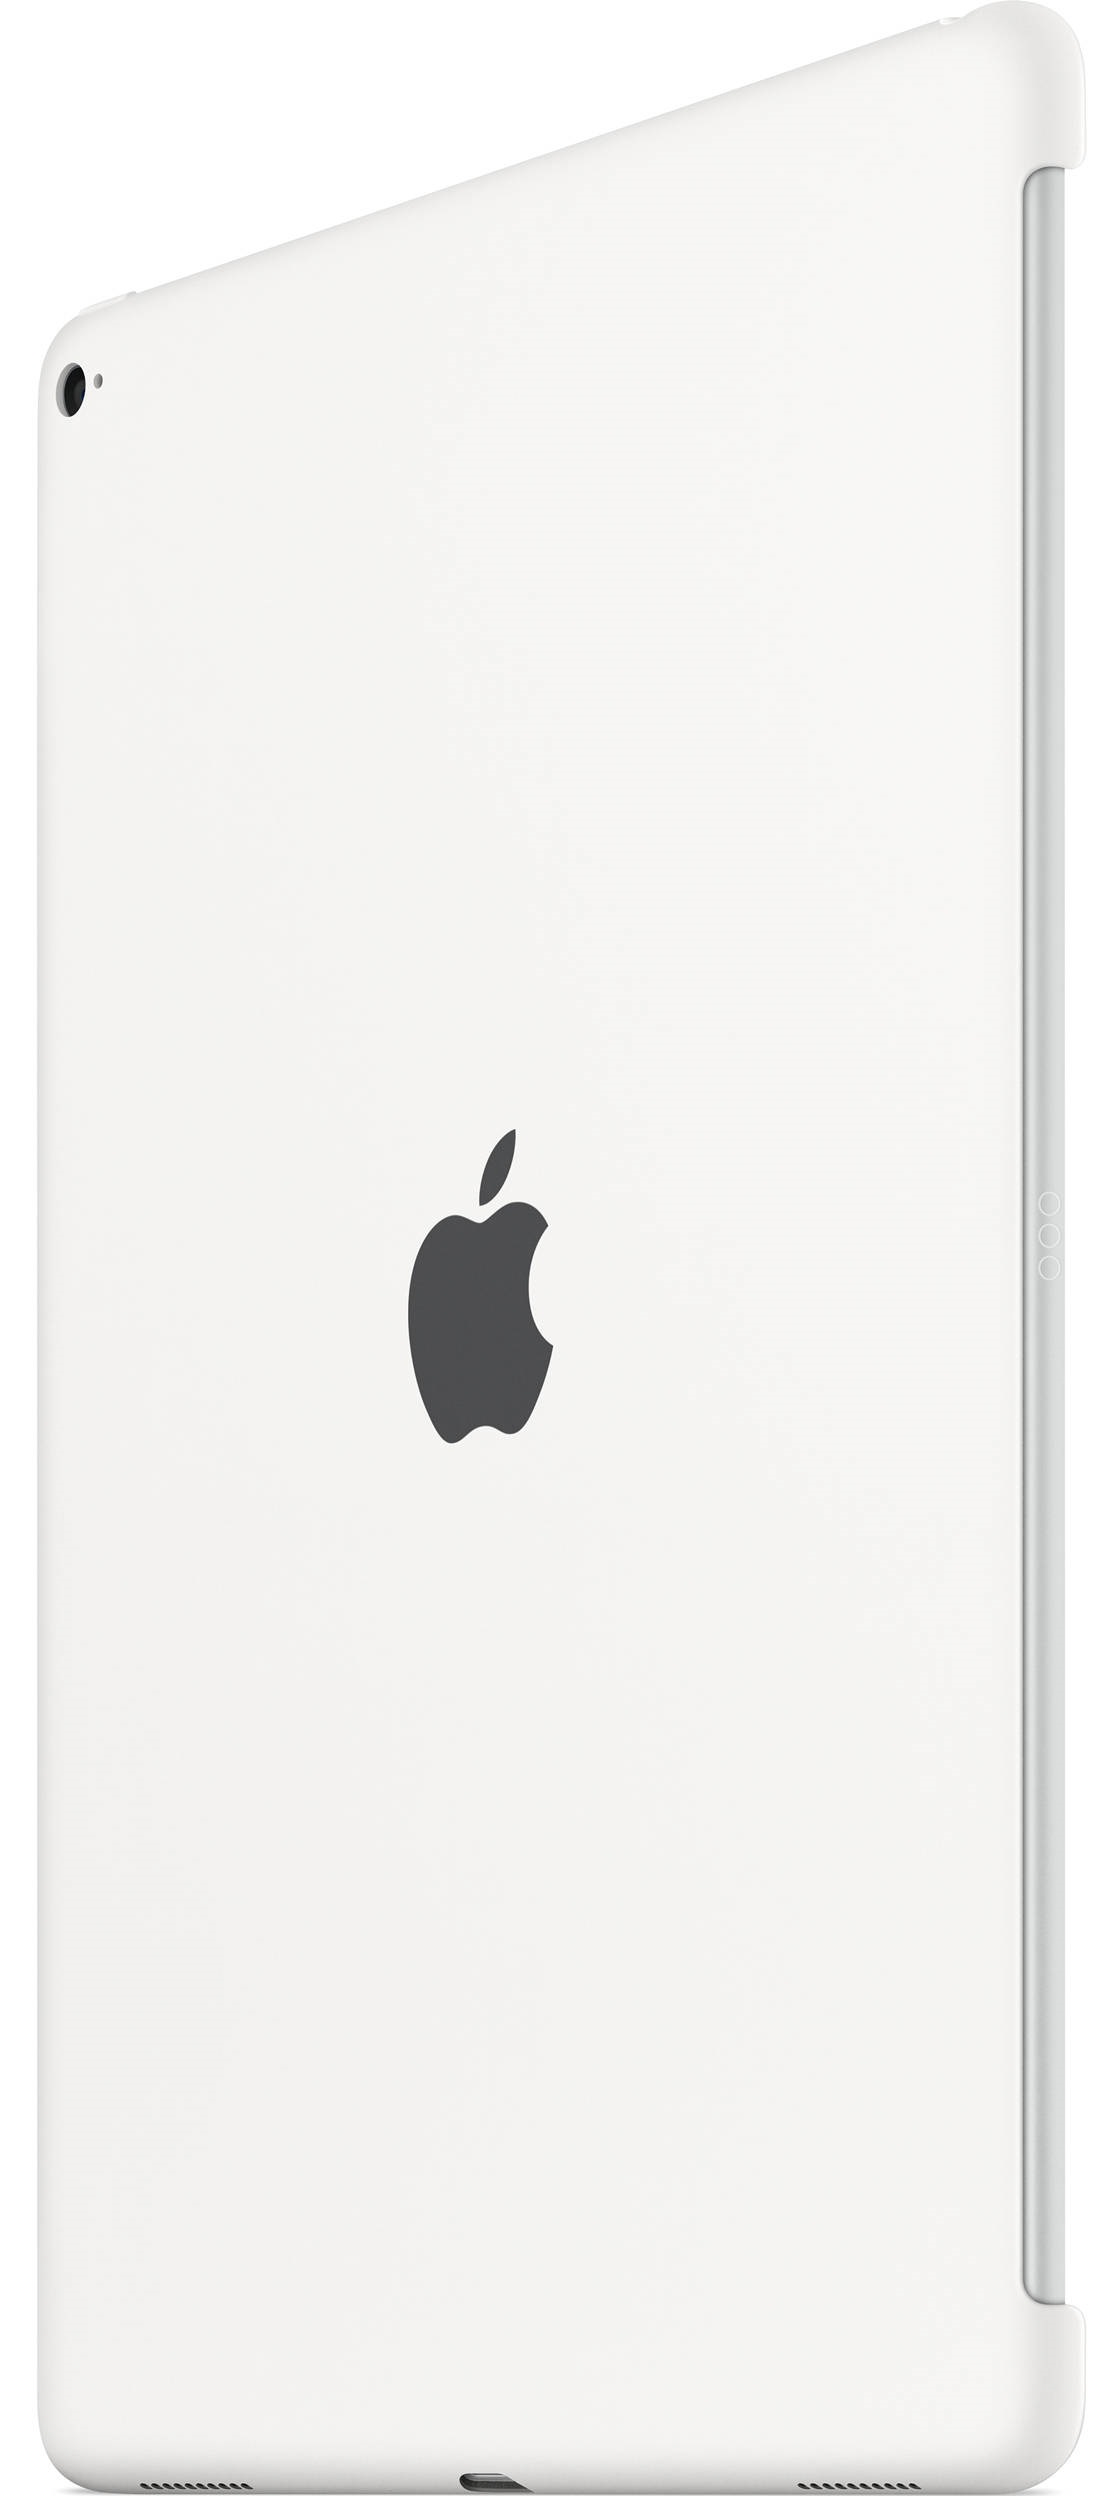 Чехол для iPad Pro 12.9 Apple Silicone Case White MK0E2ZM/A